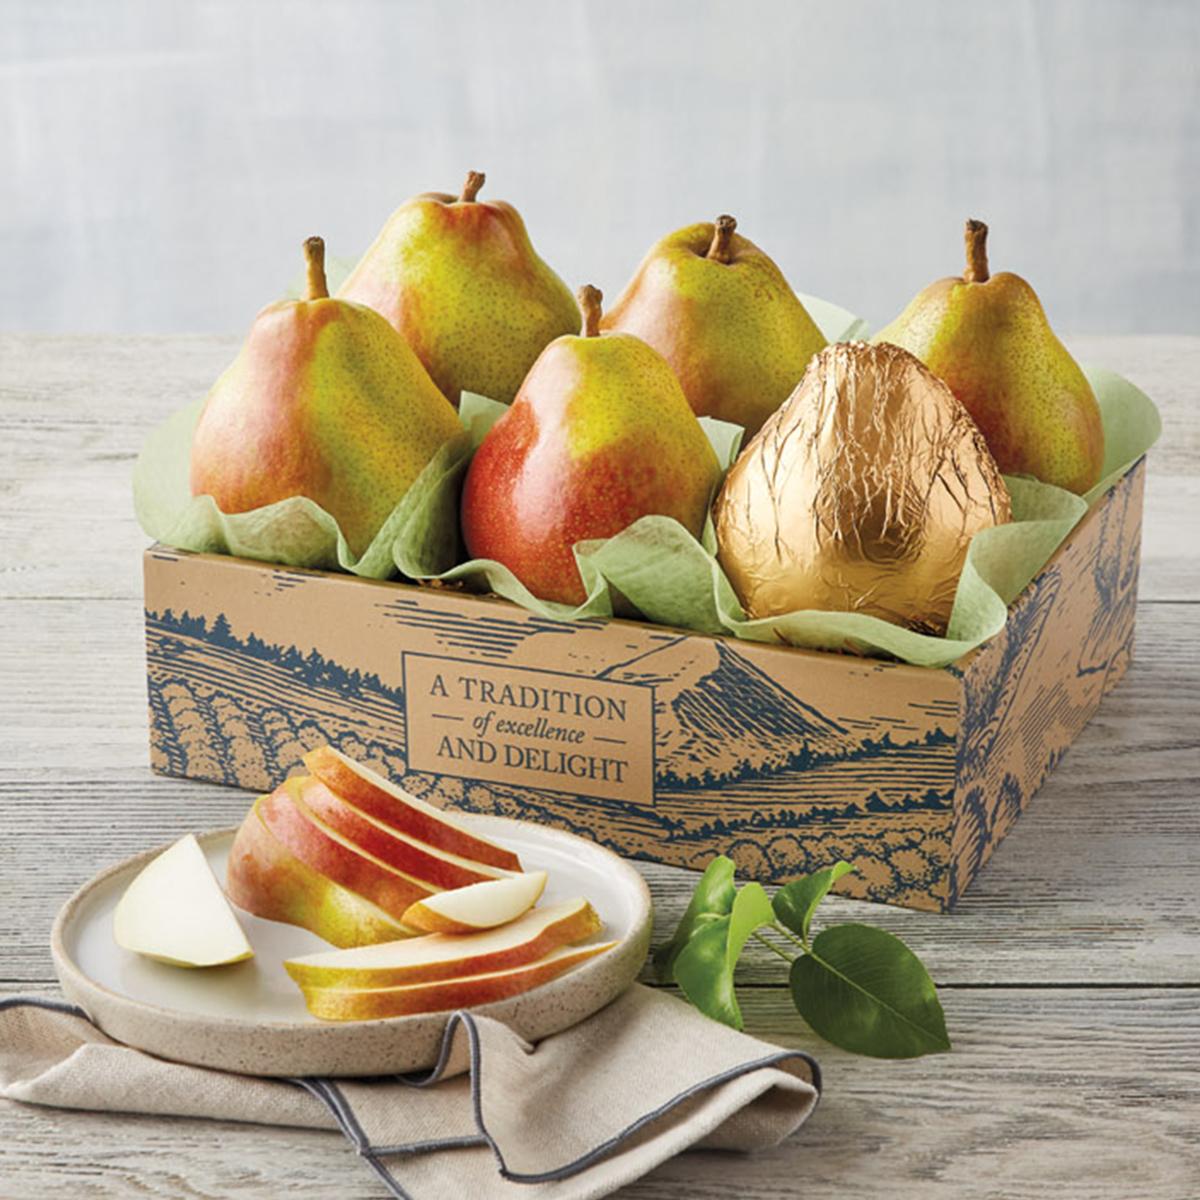 royal riviera pear last minute gift idea